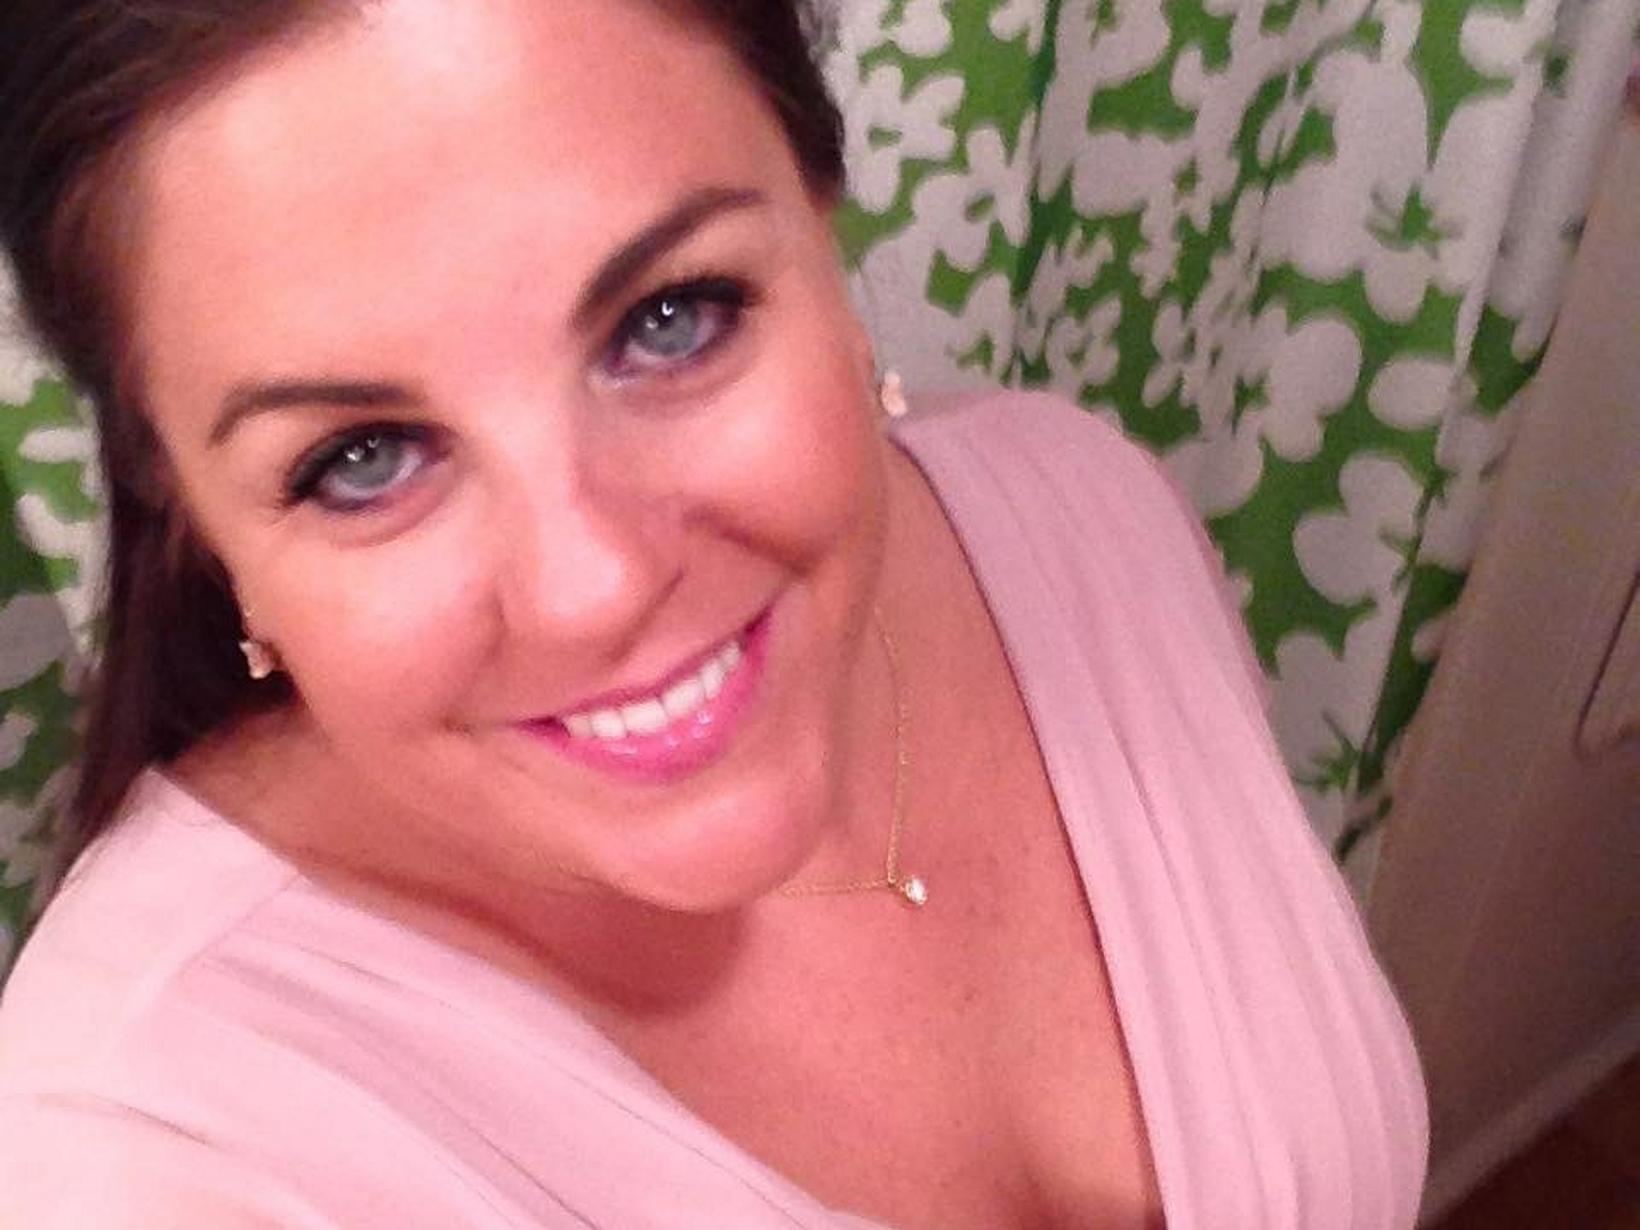 Amanda from Tampa, Florida, United States